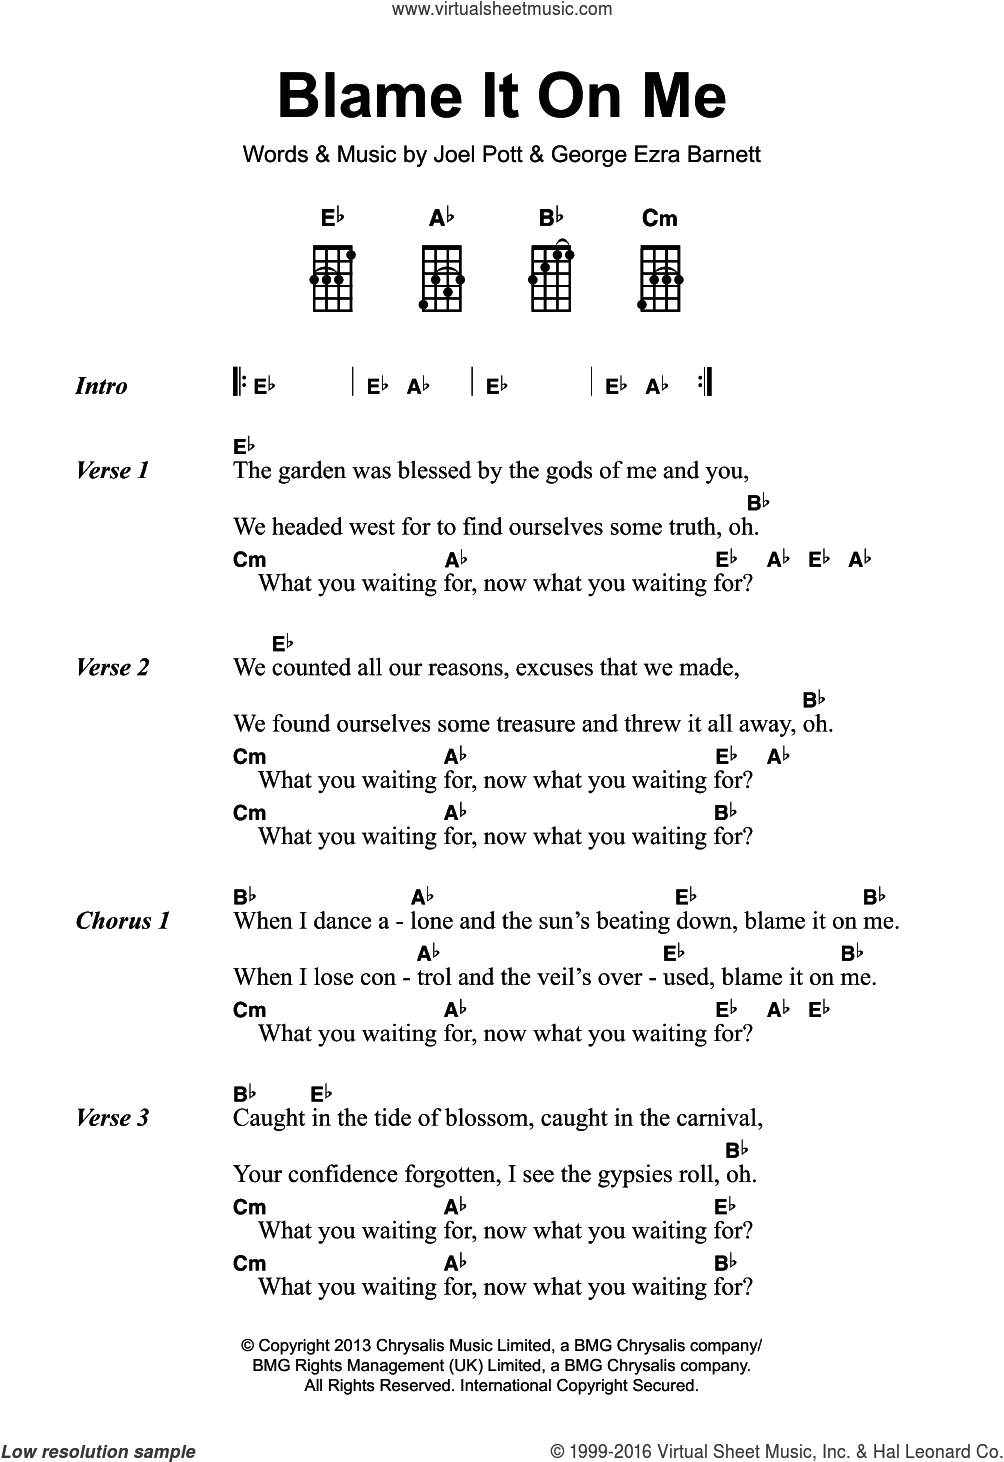 Blame It On Me sheet music for voice, piano or guitar by George Ezra, George Ezra Barnett and Joel Pott, intermediate skill level